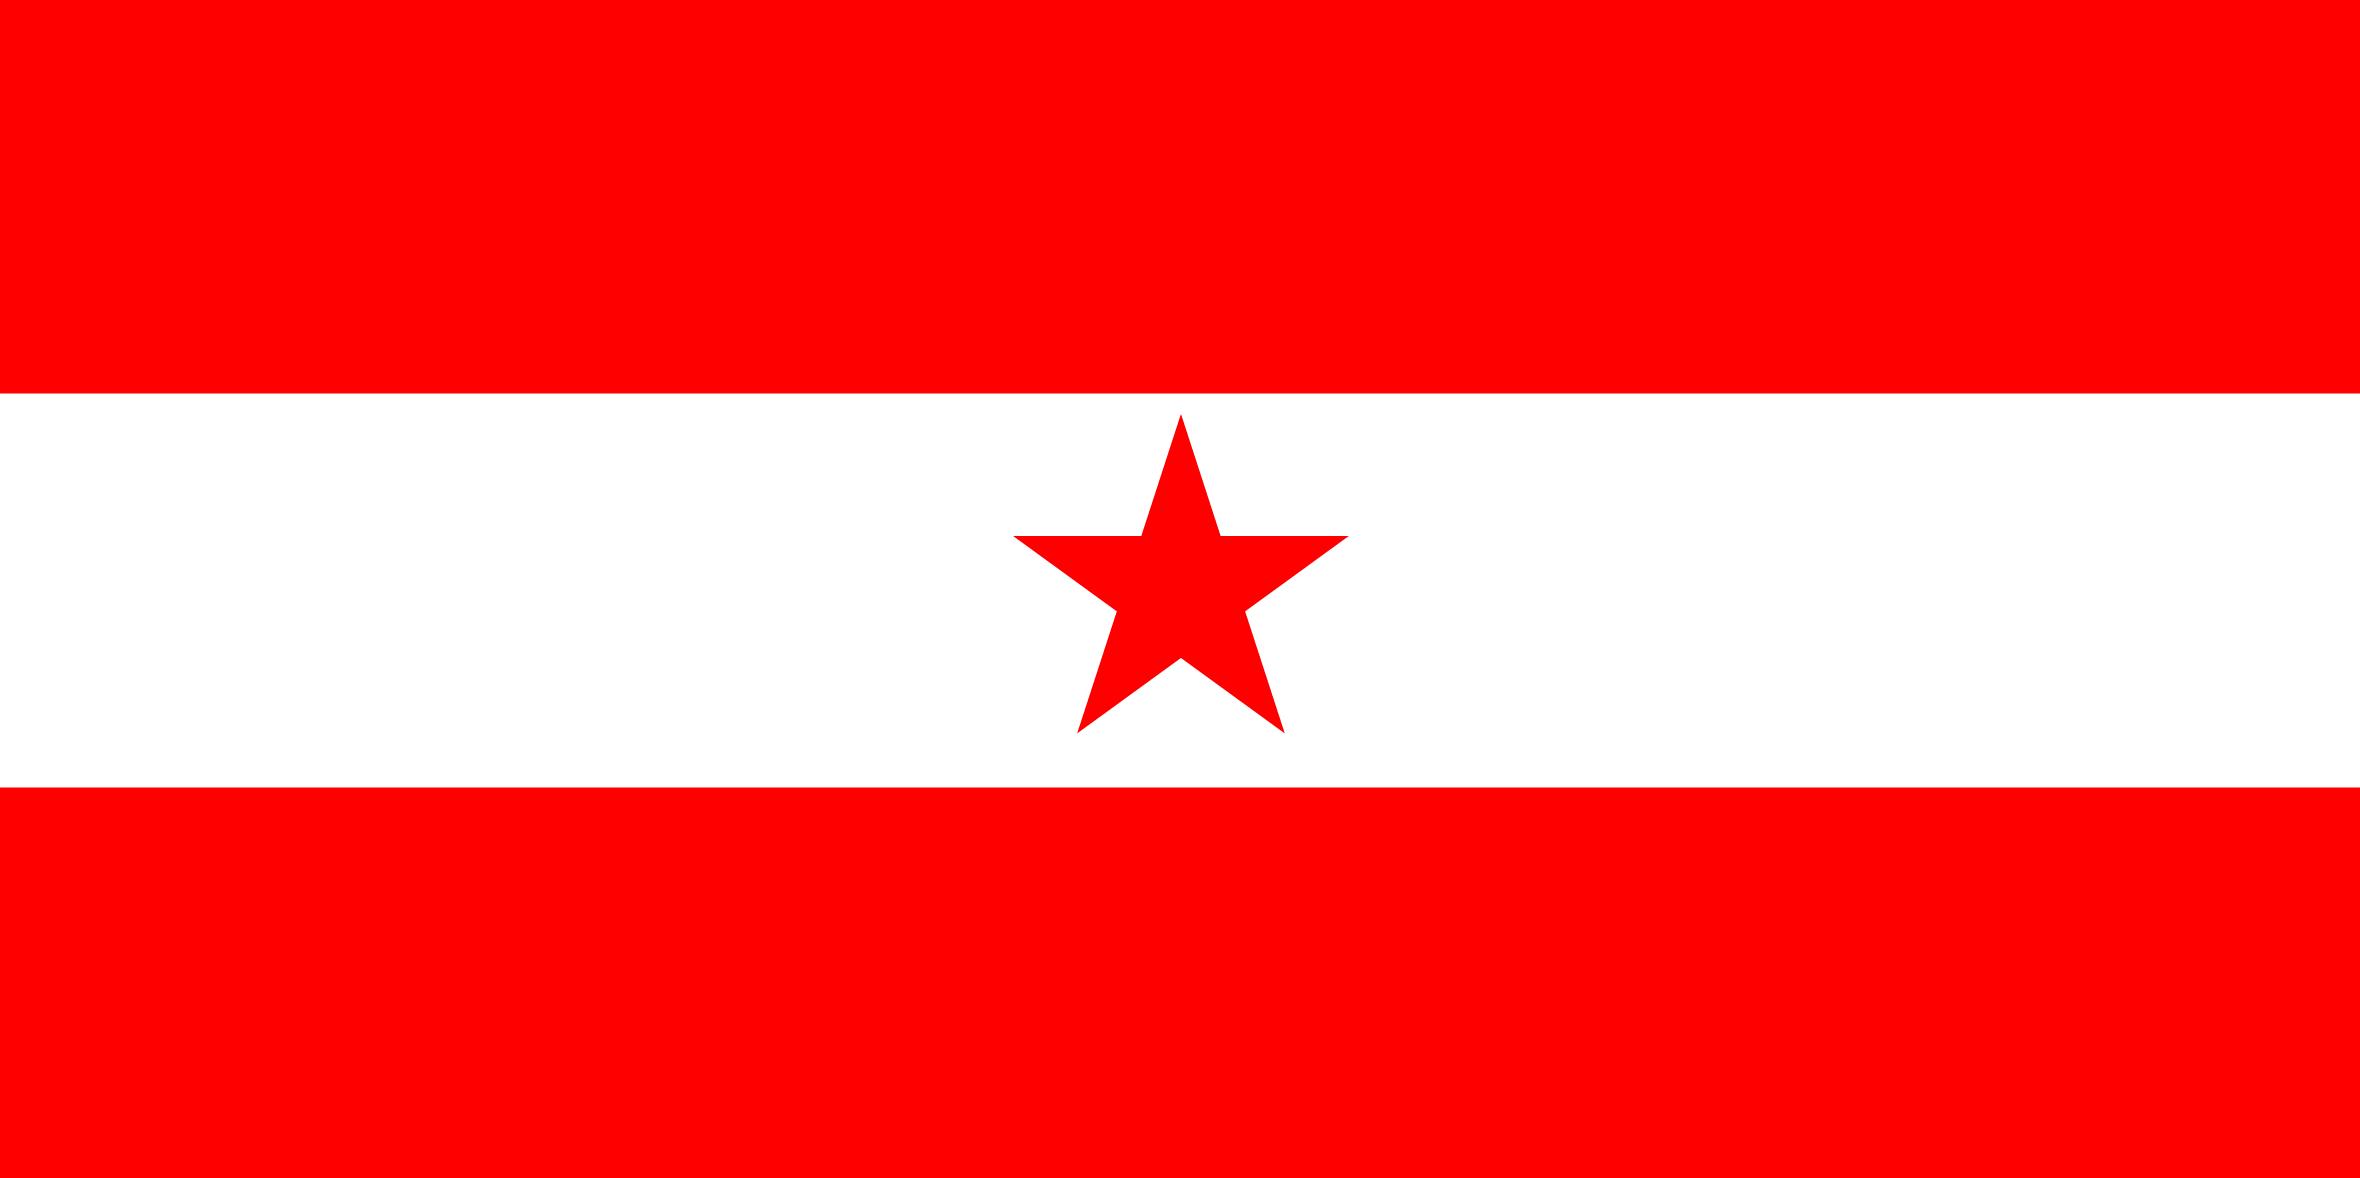 Iskolata karogs.png